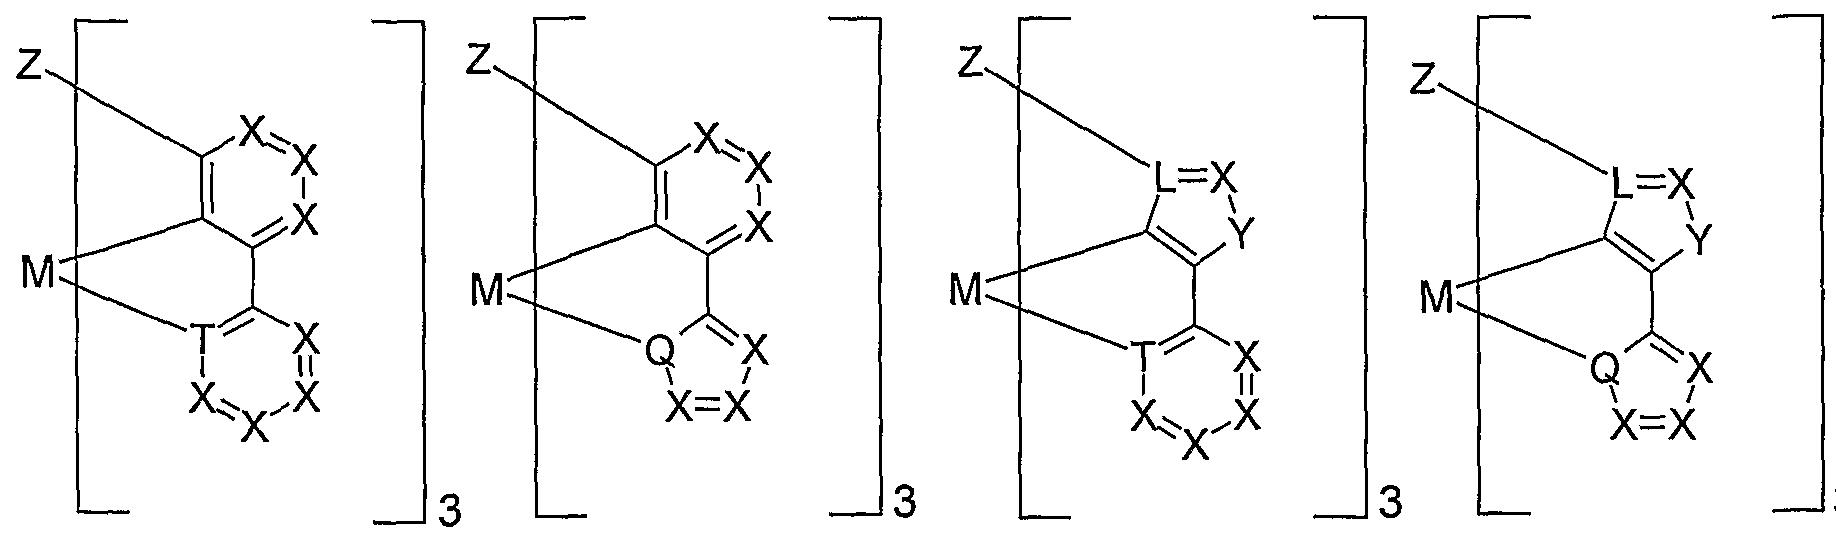 tle7240sl电路图